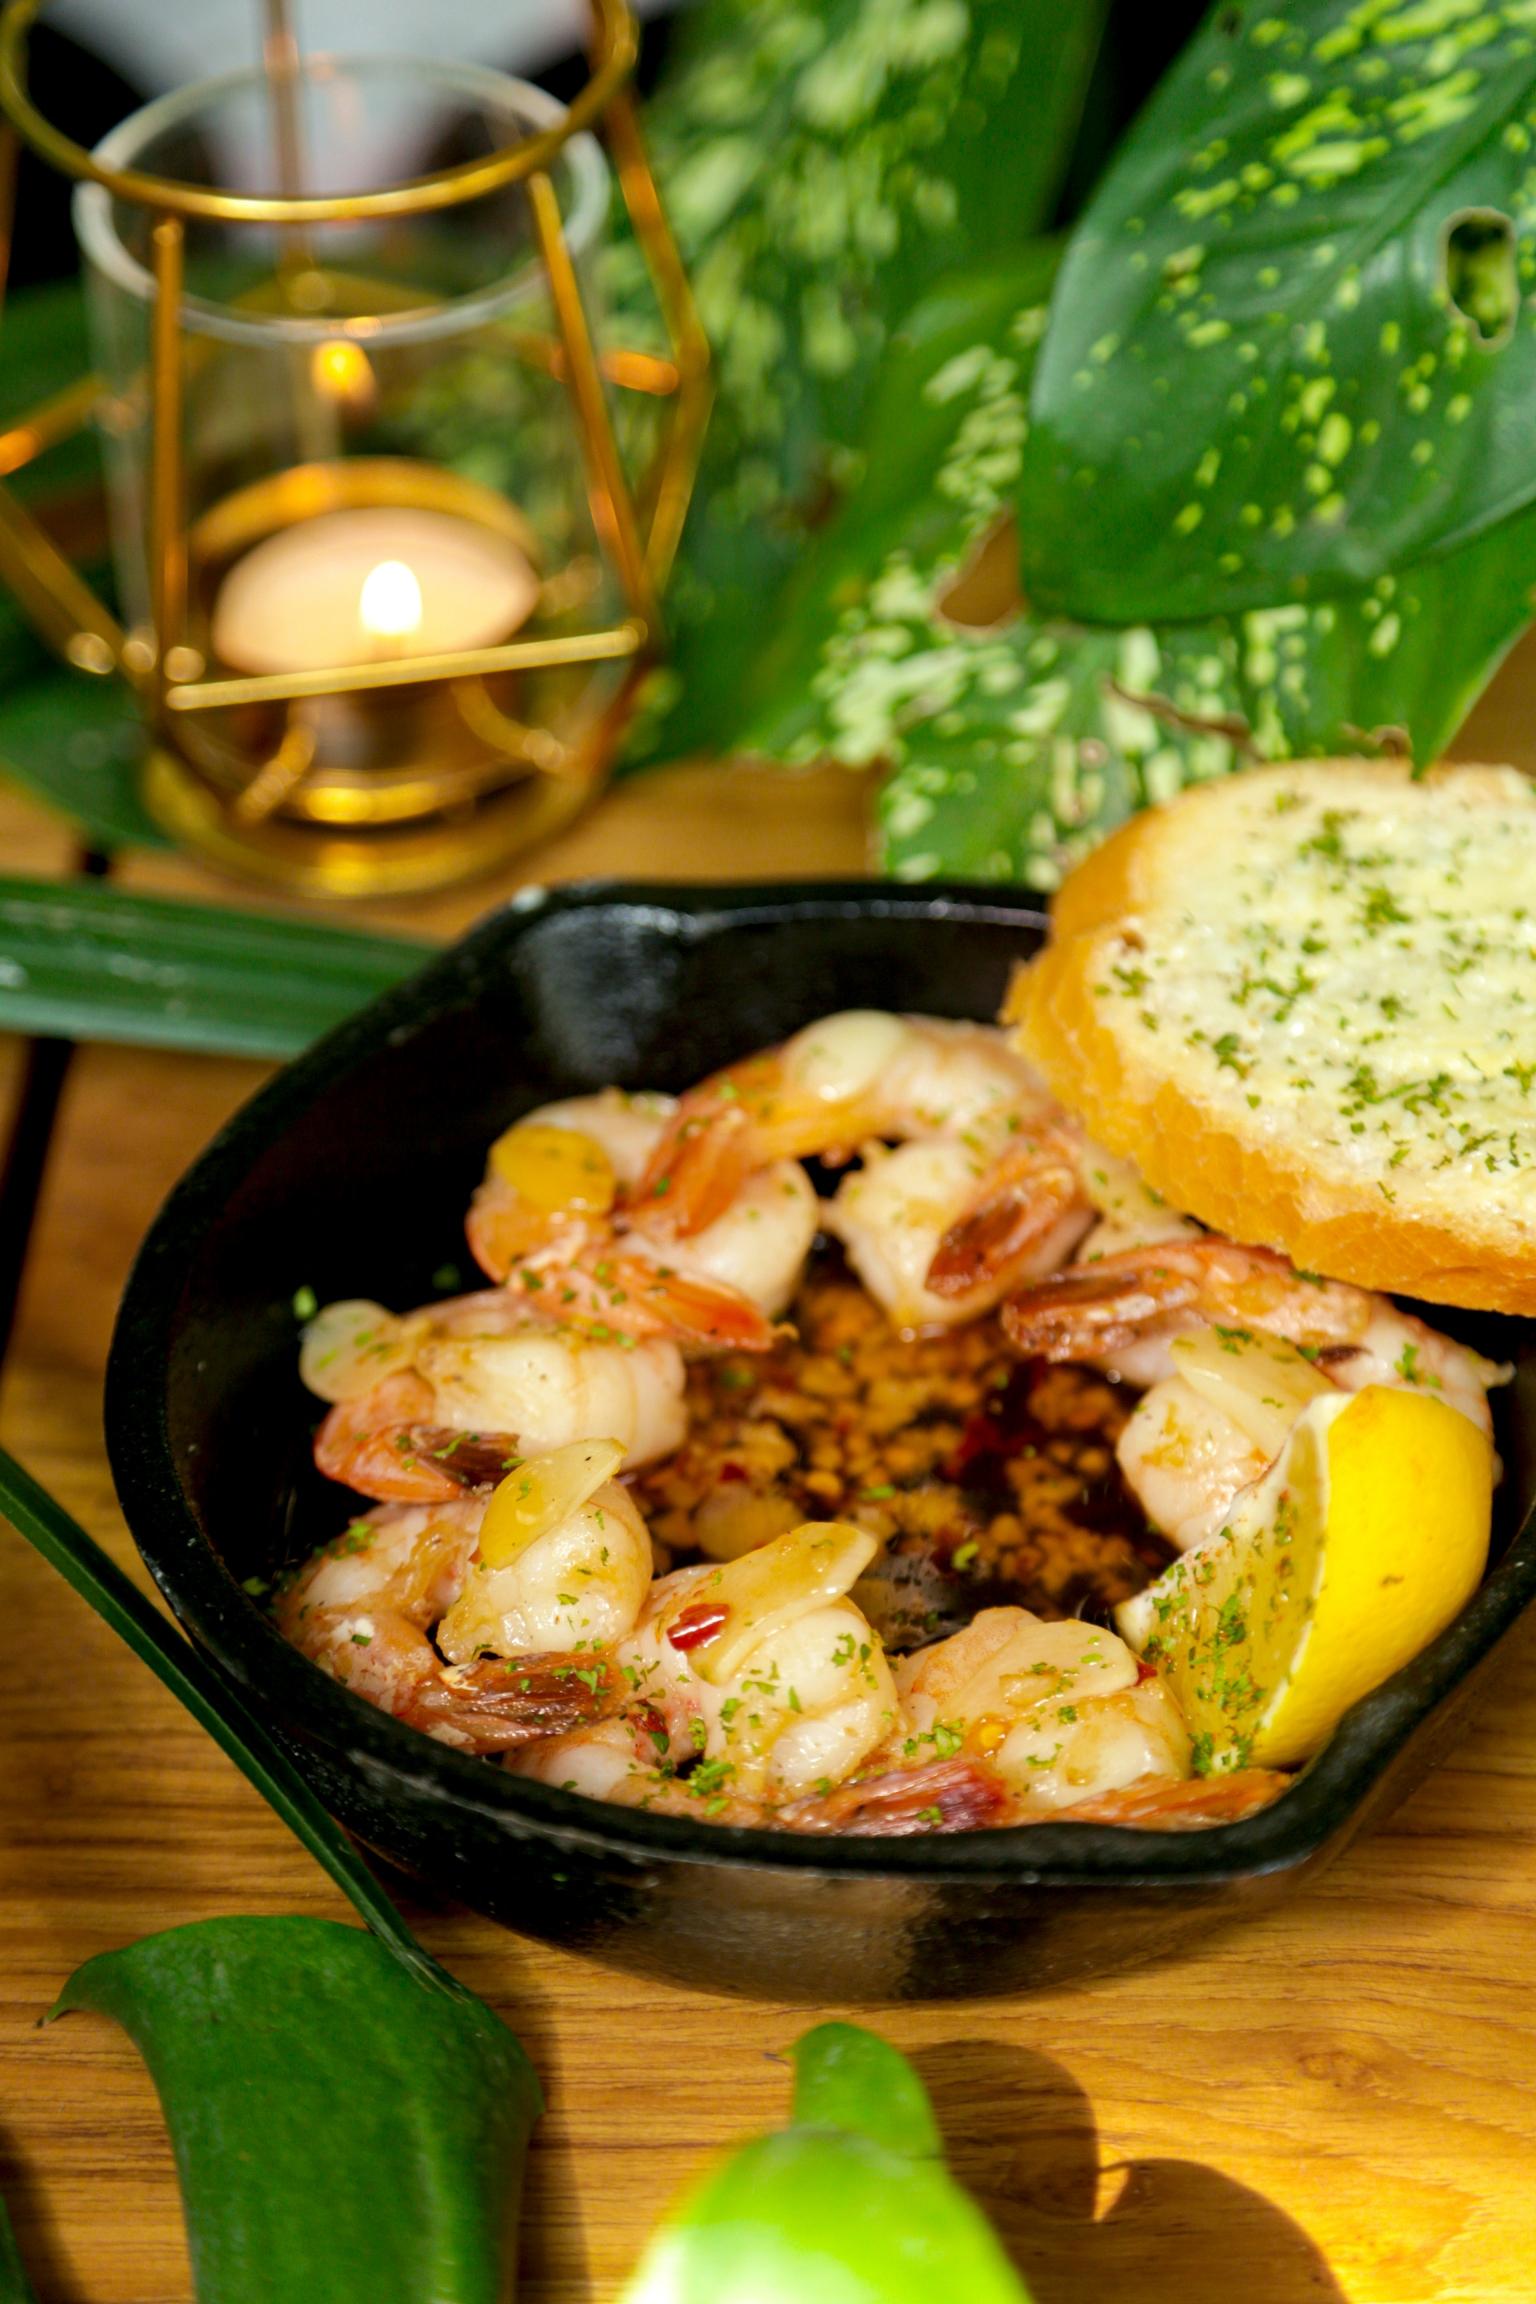 Mexican Shrimp Skillet at Cafe Panama, Lower Parel